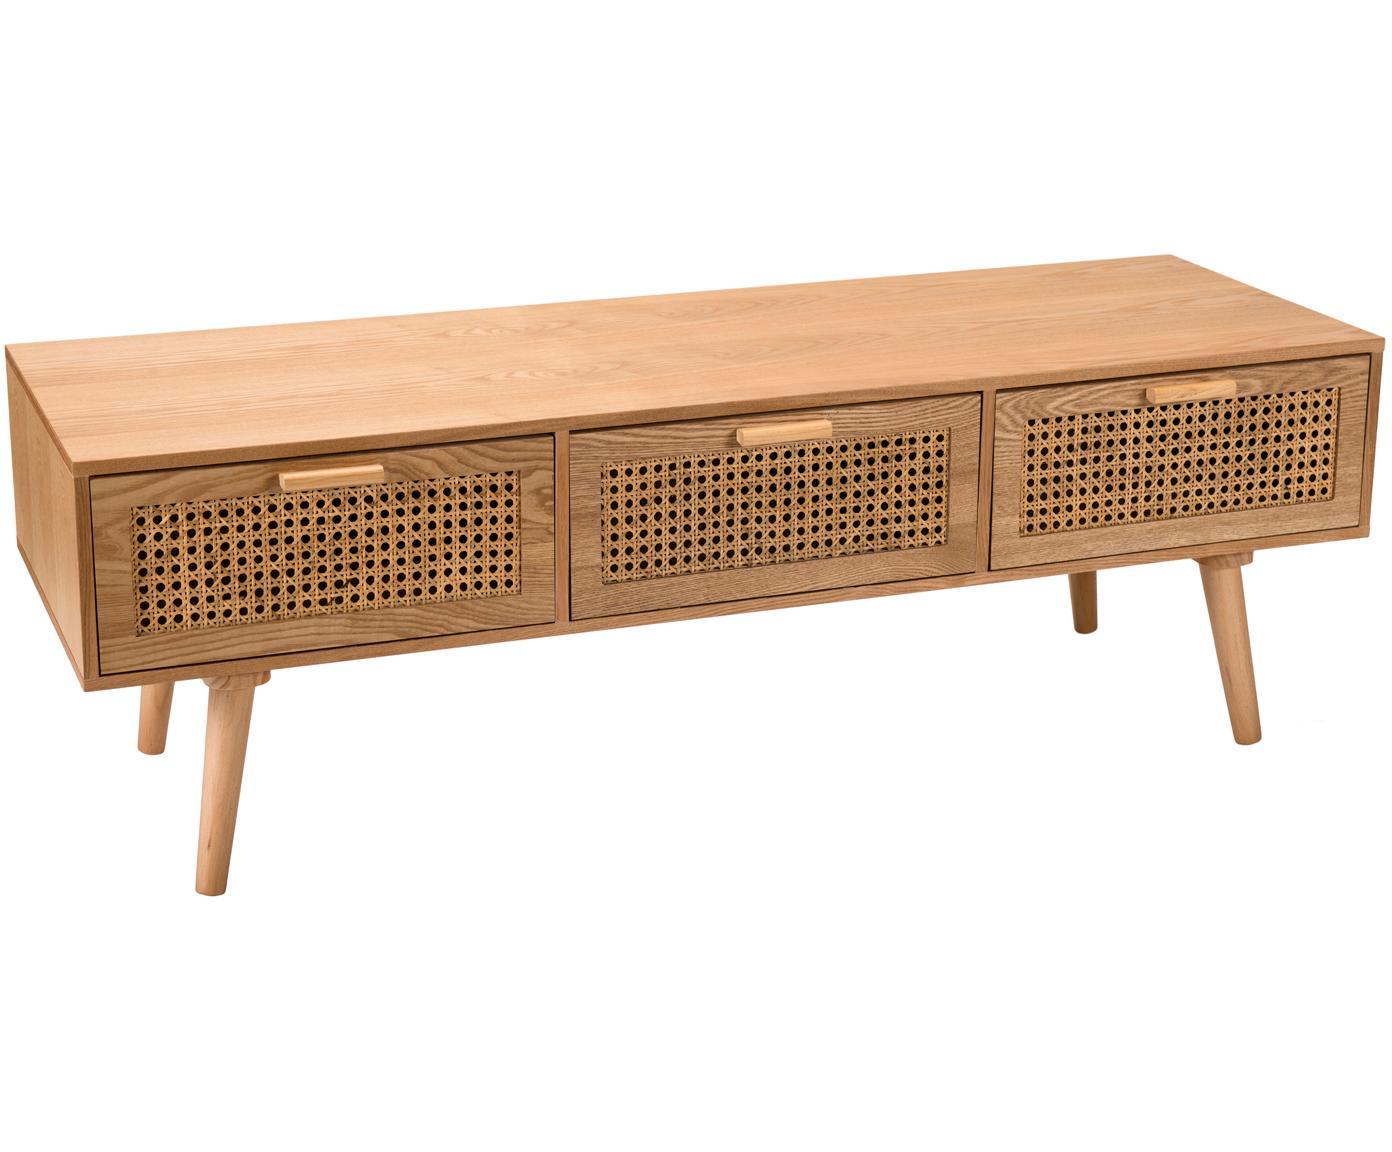 Mueble TV en madera Romeo, Tablero de fibras de densidad media (MDF), chapada en madera de fresno, Fresno, An 120 x Al 40 cm